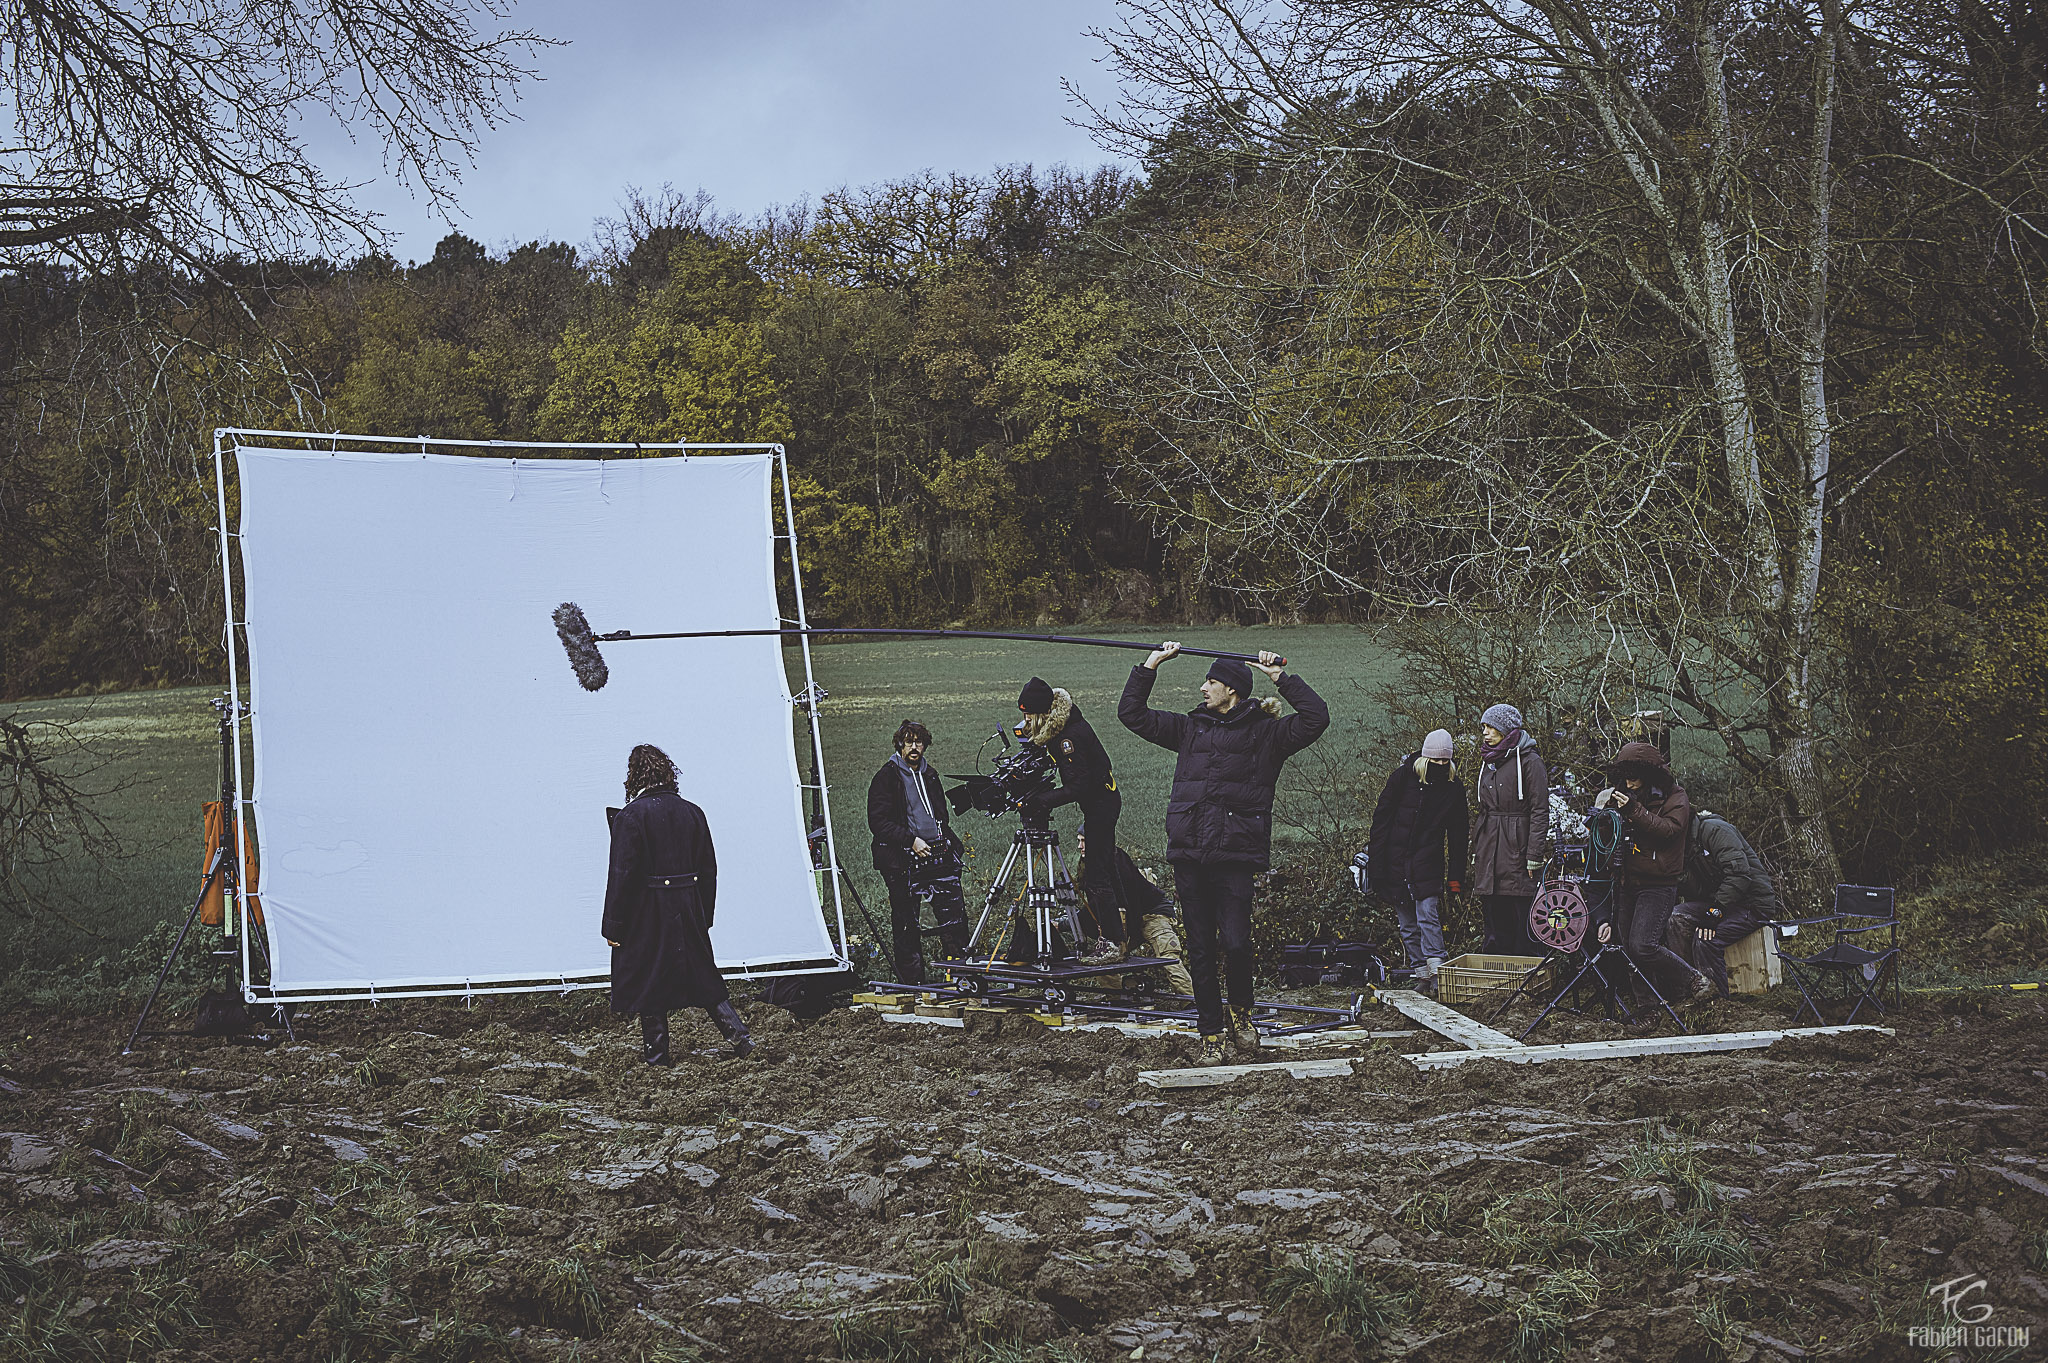 tournage - Fabien Garou Photographie